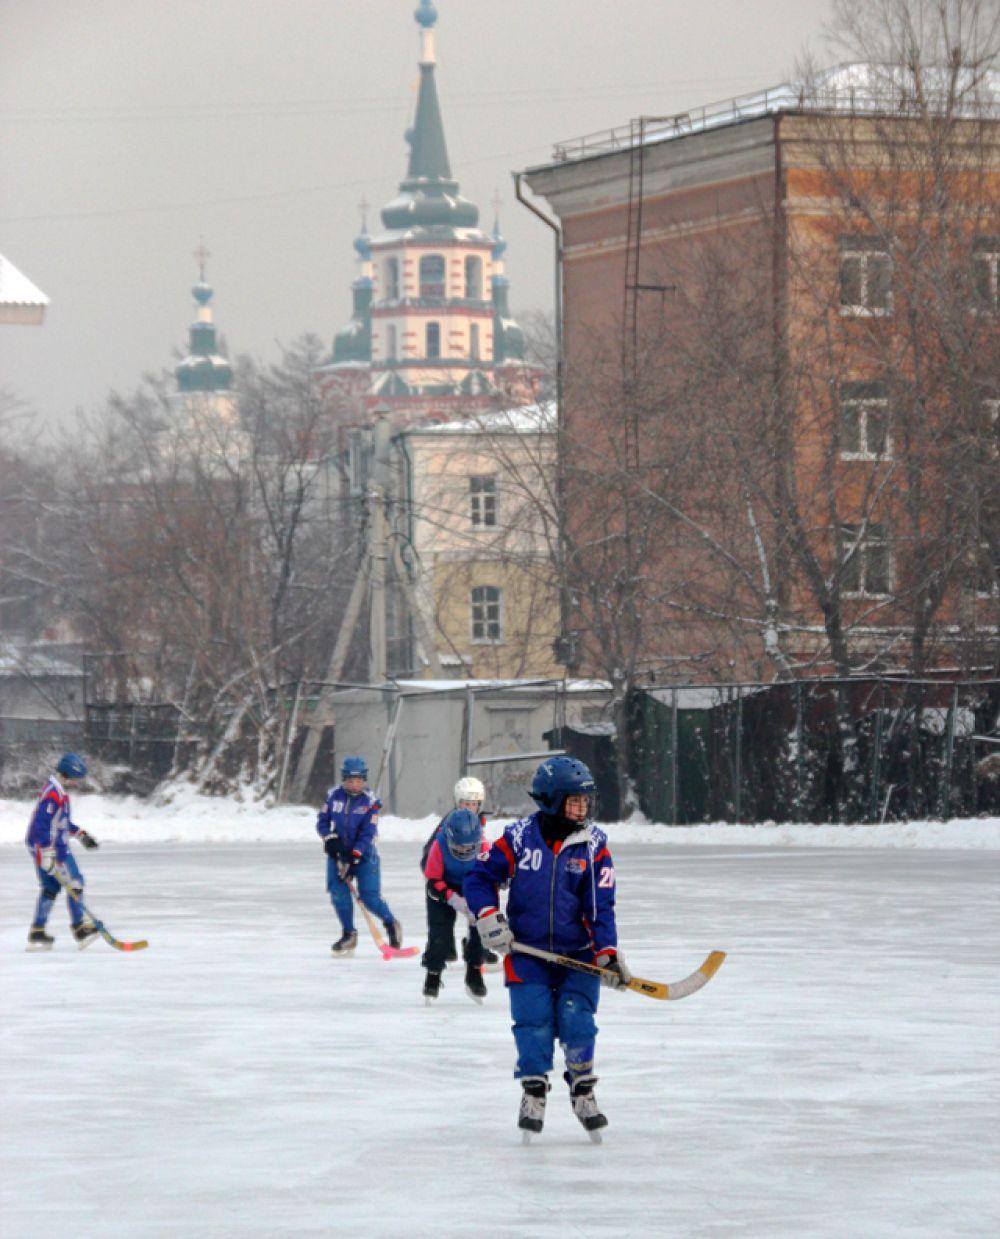 Сюда спешат и фигуристы и хоккеисты.